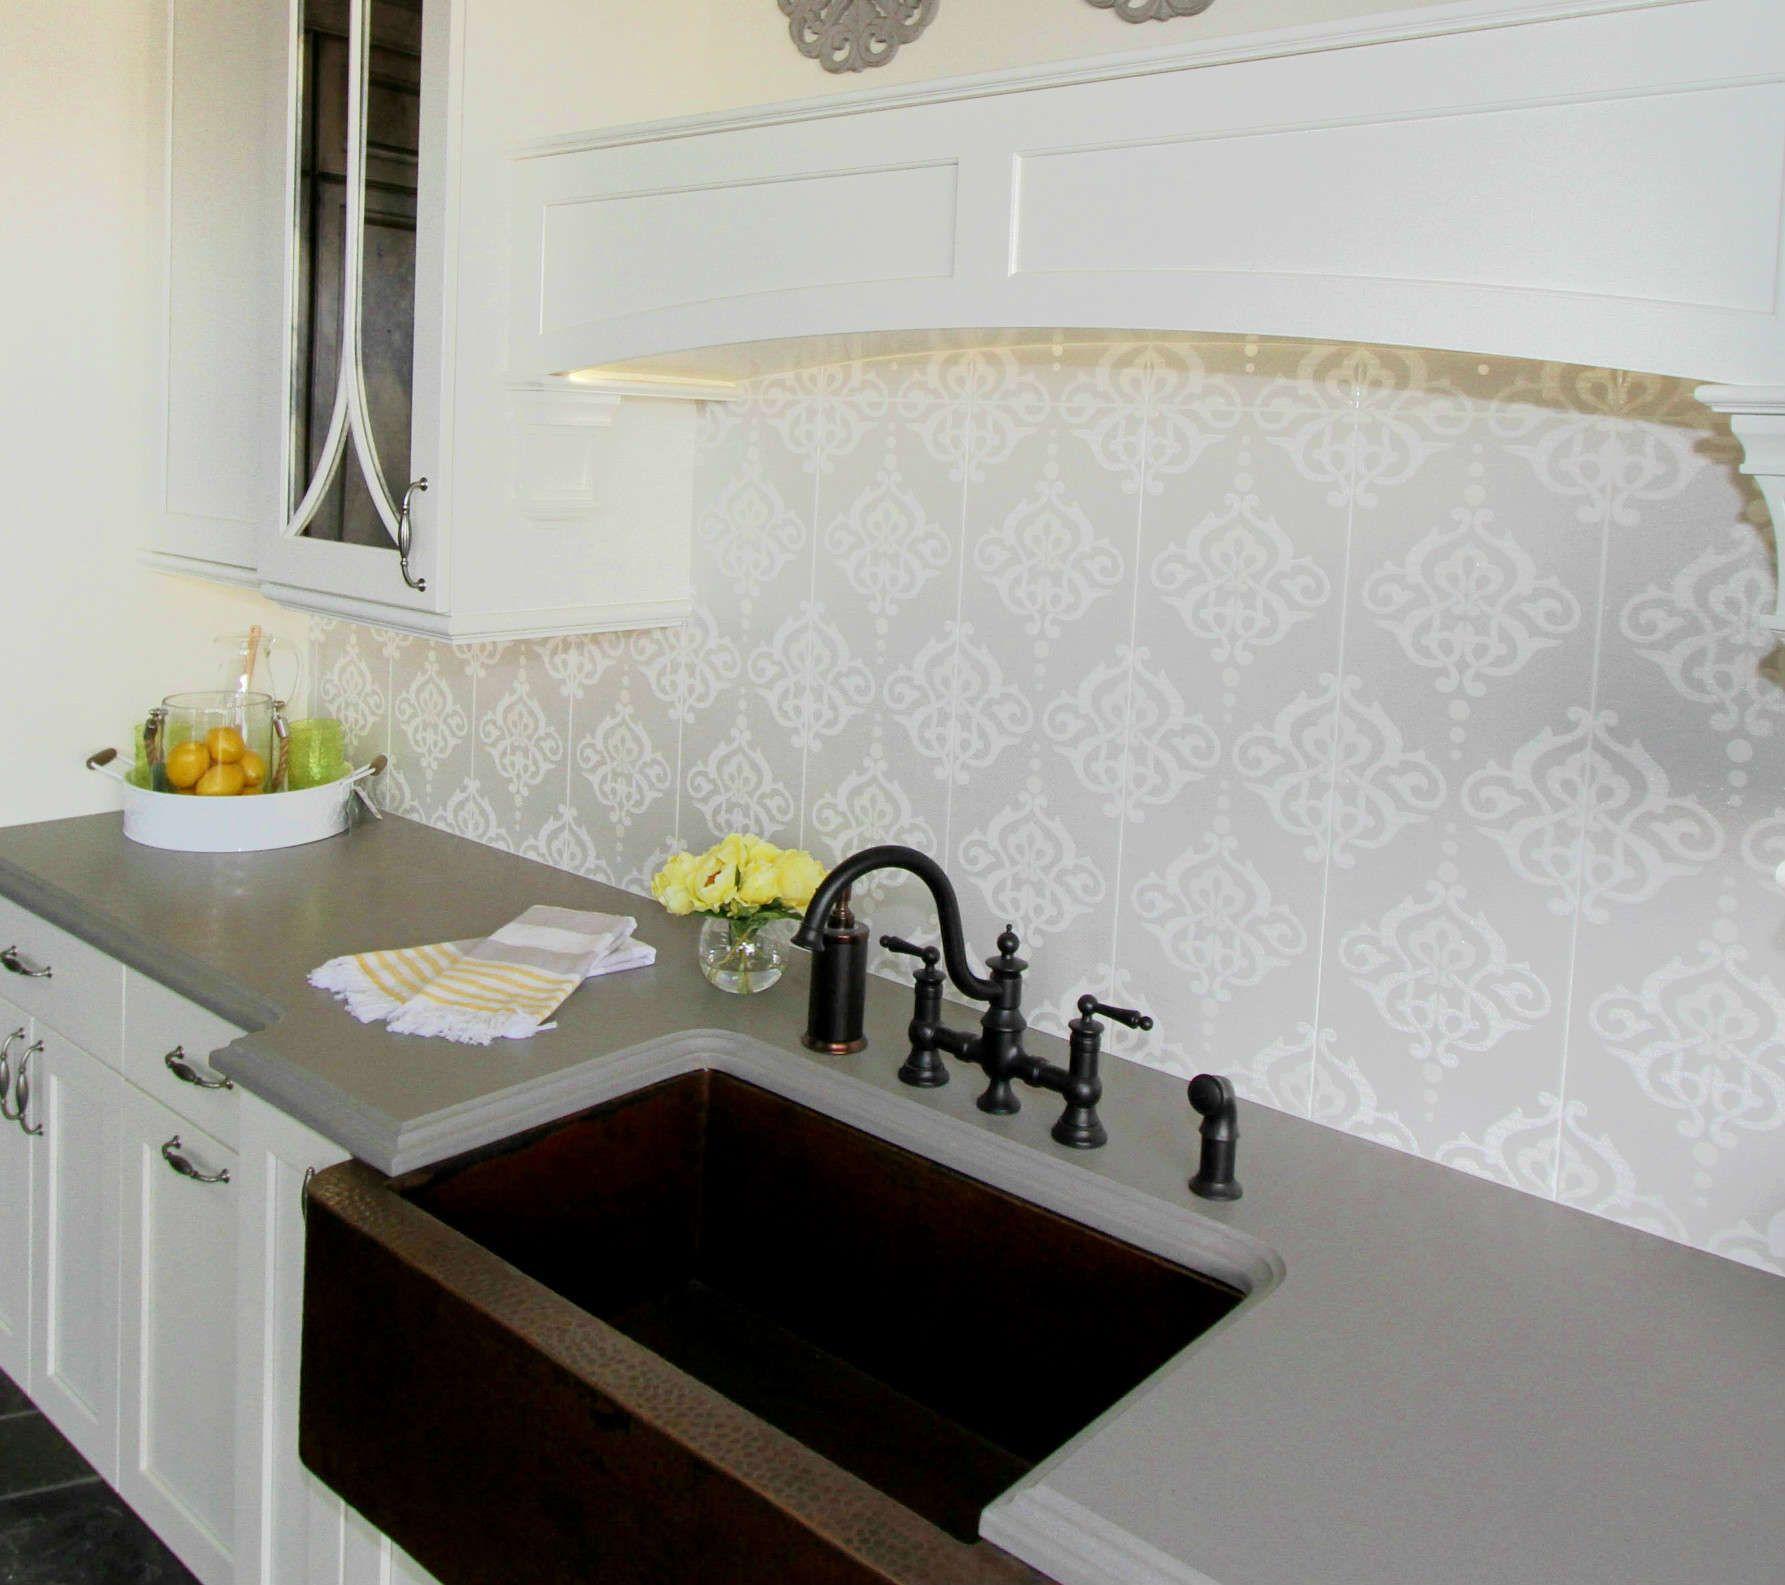 The New Age Of Tile Texture Kbf Design Gallery Tiles Texture Textured Tile Backsplash Antique Farmhouse Sink